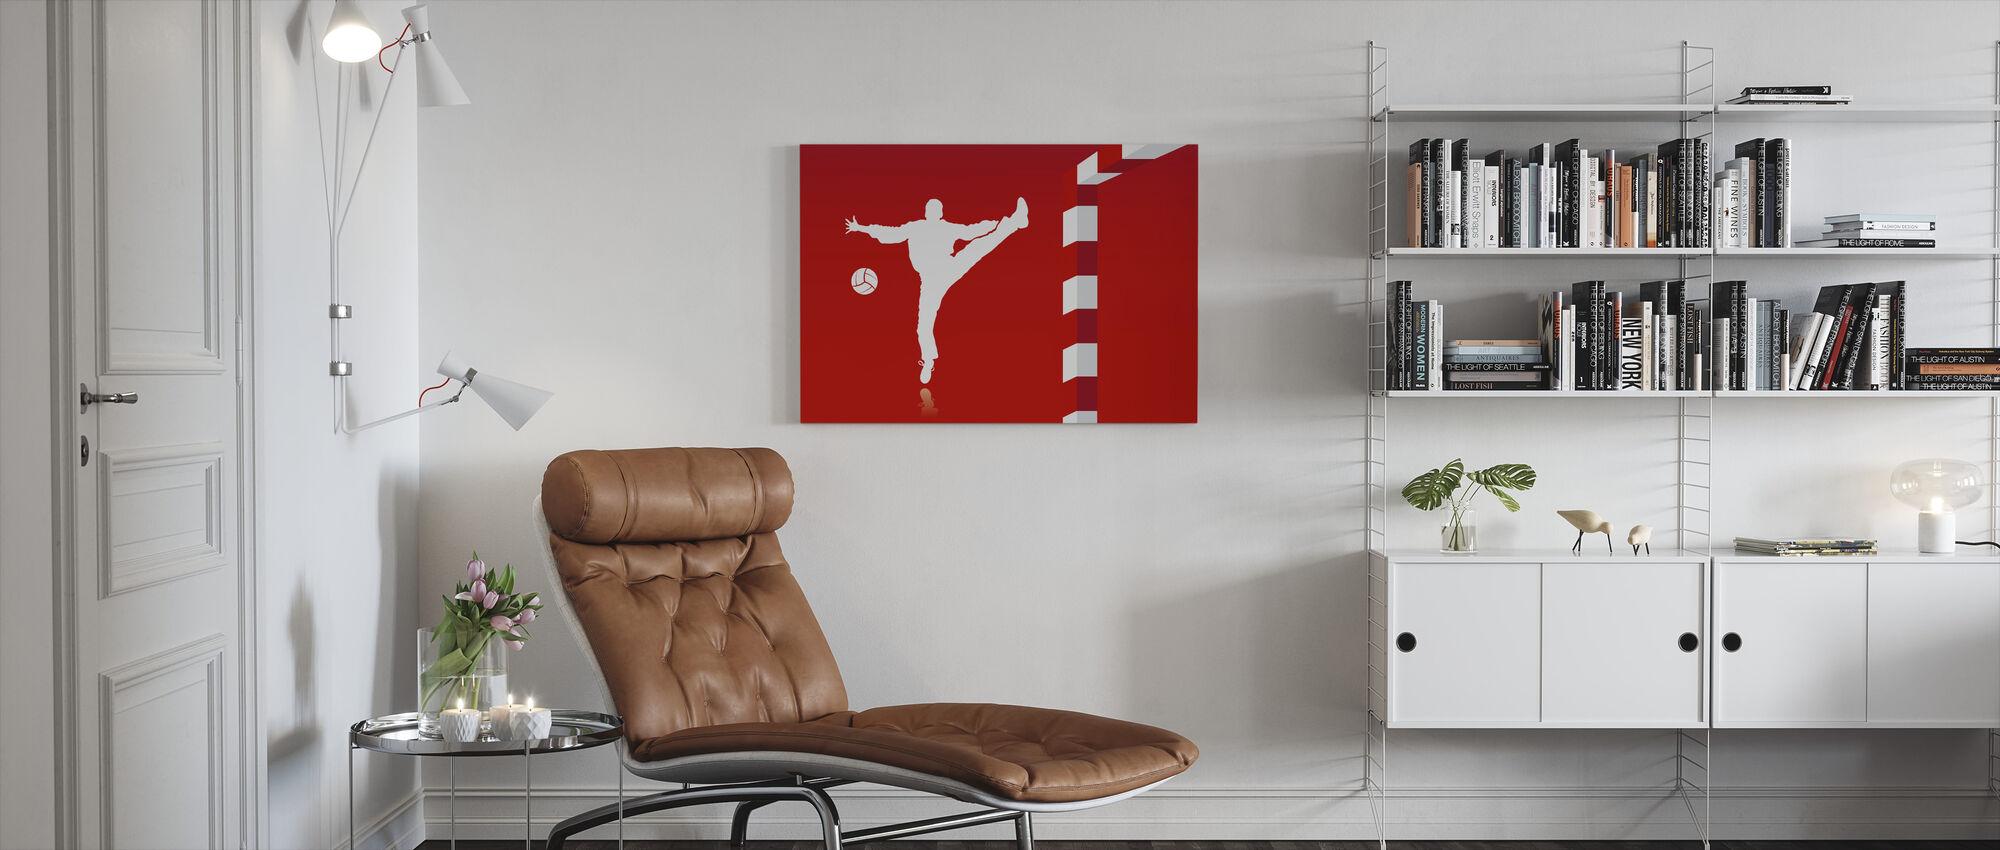 Handbal - Rood - Canvas print - Woonkamer